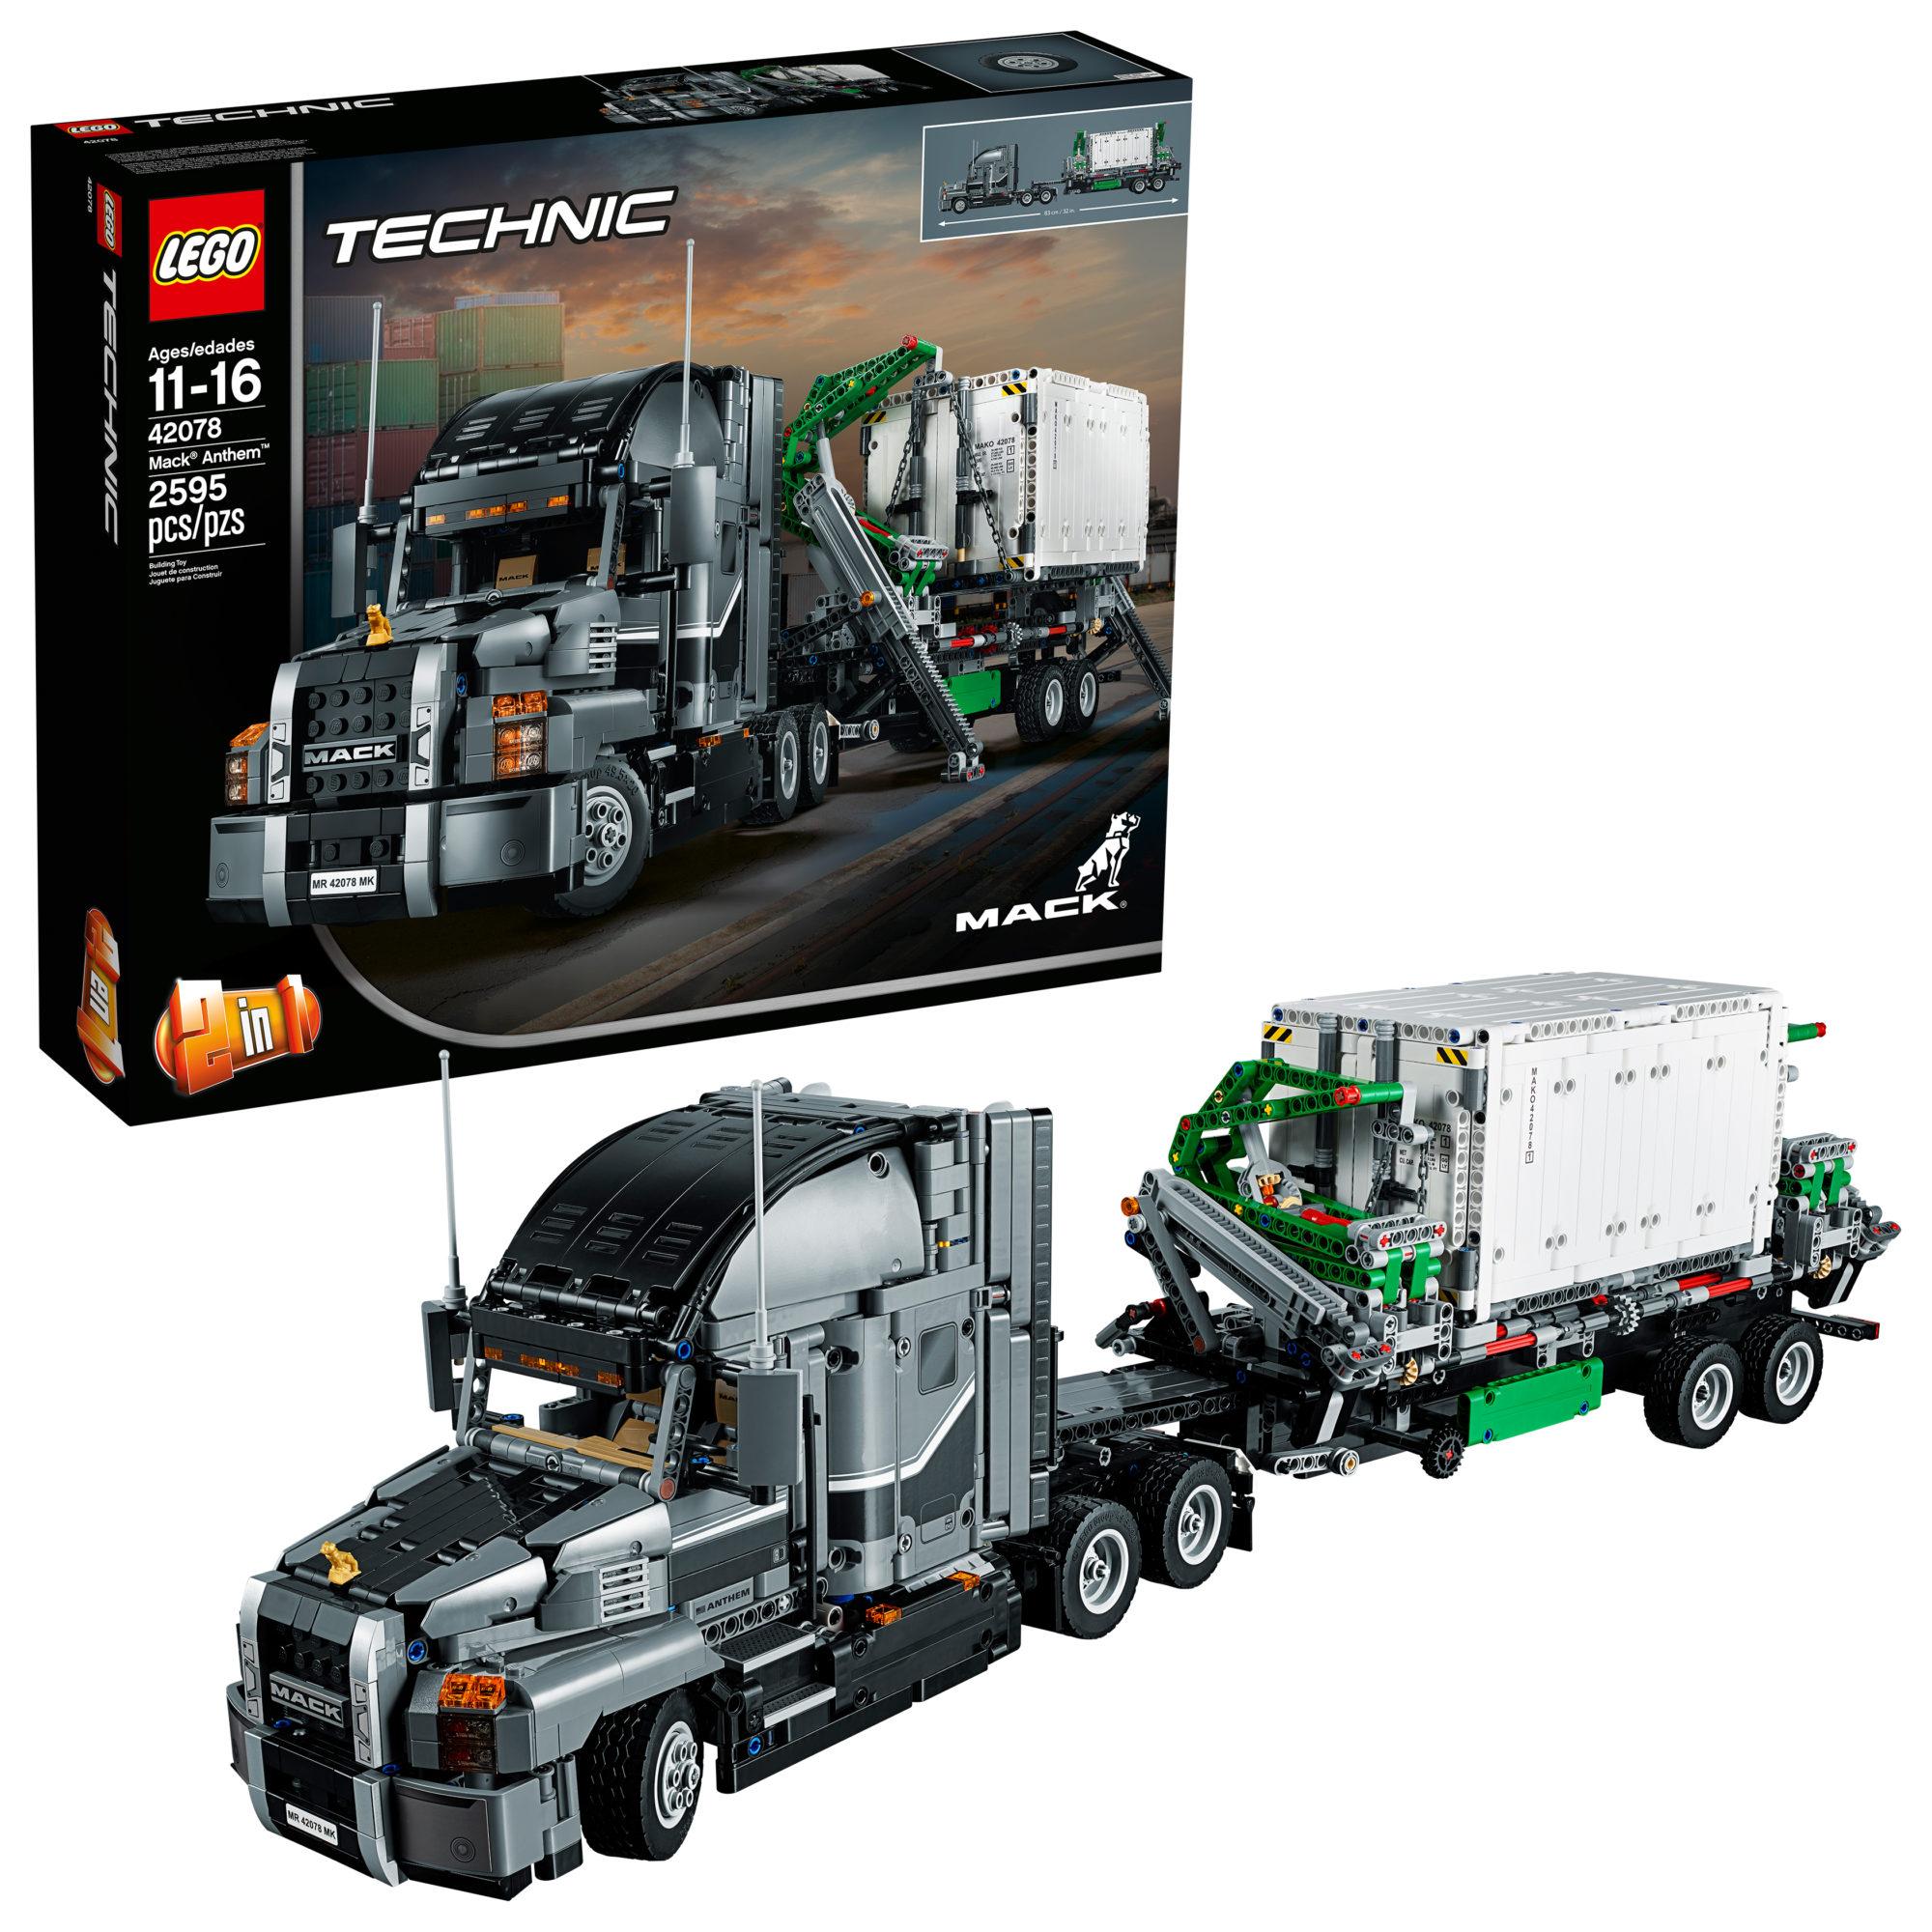 Walmart Cyber Monday: LEGO Technic Mack Anthem 42078 Building Set ONLY $129.99!